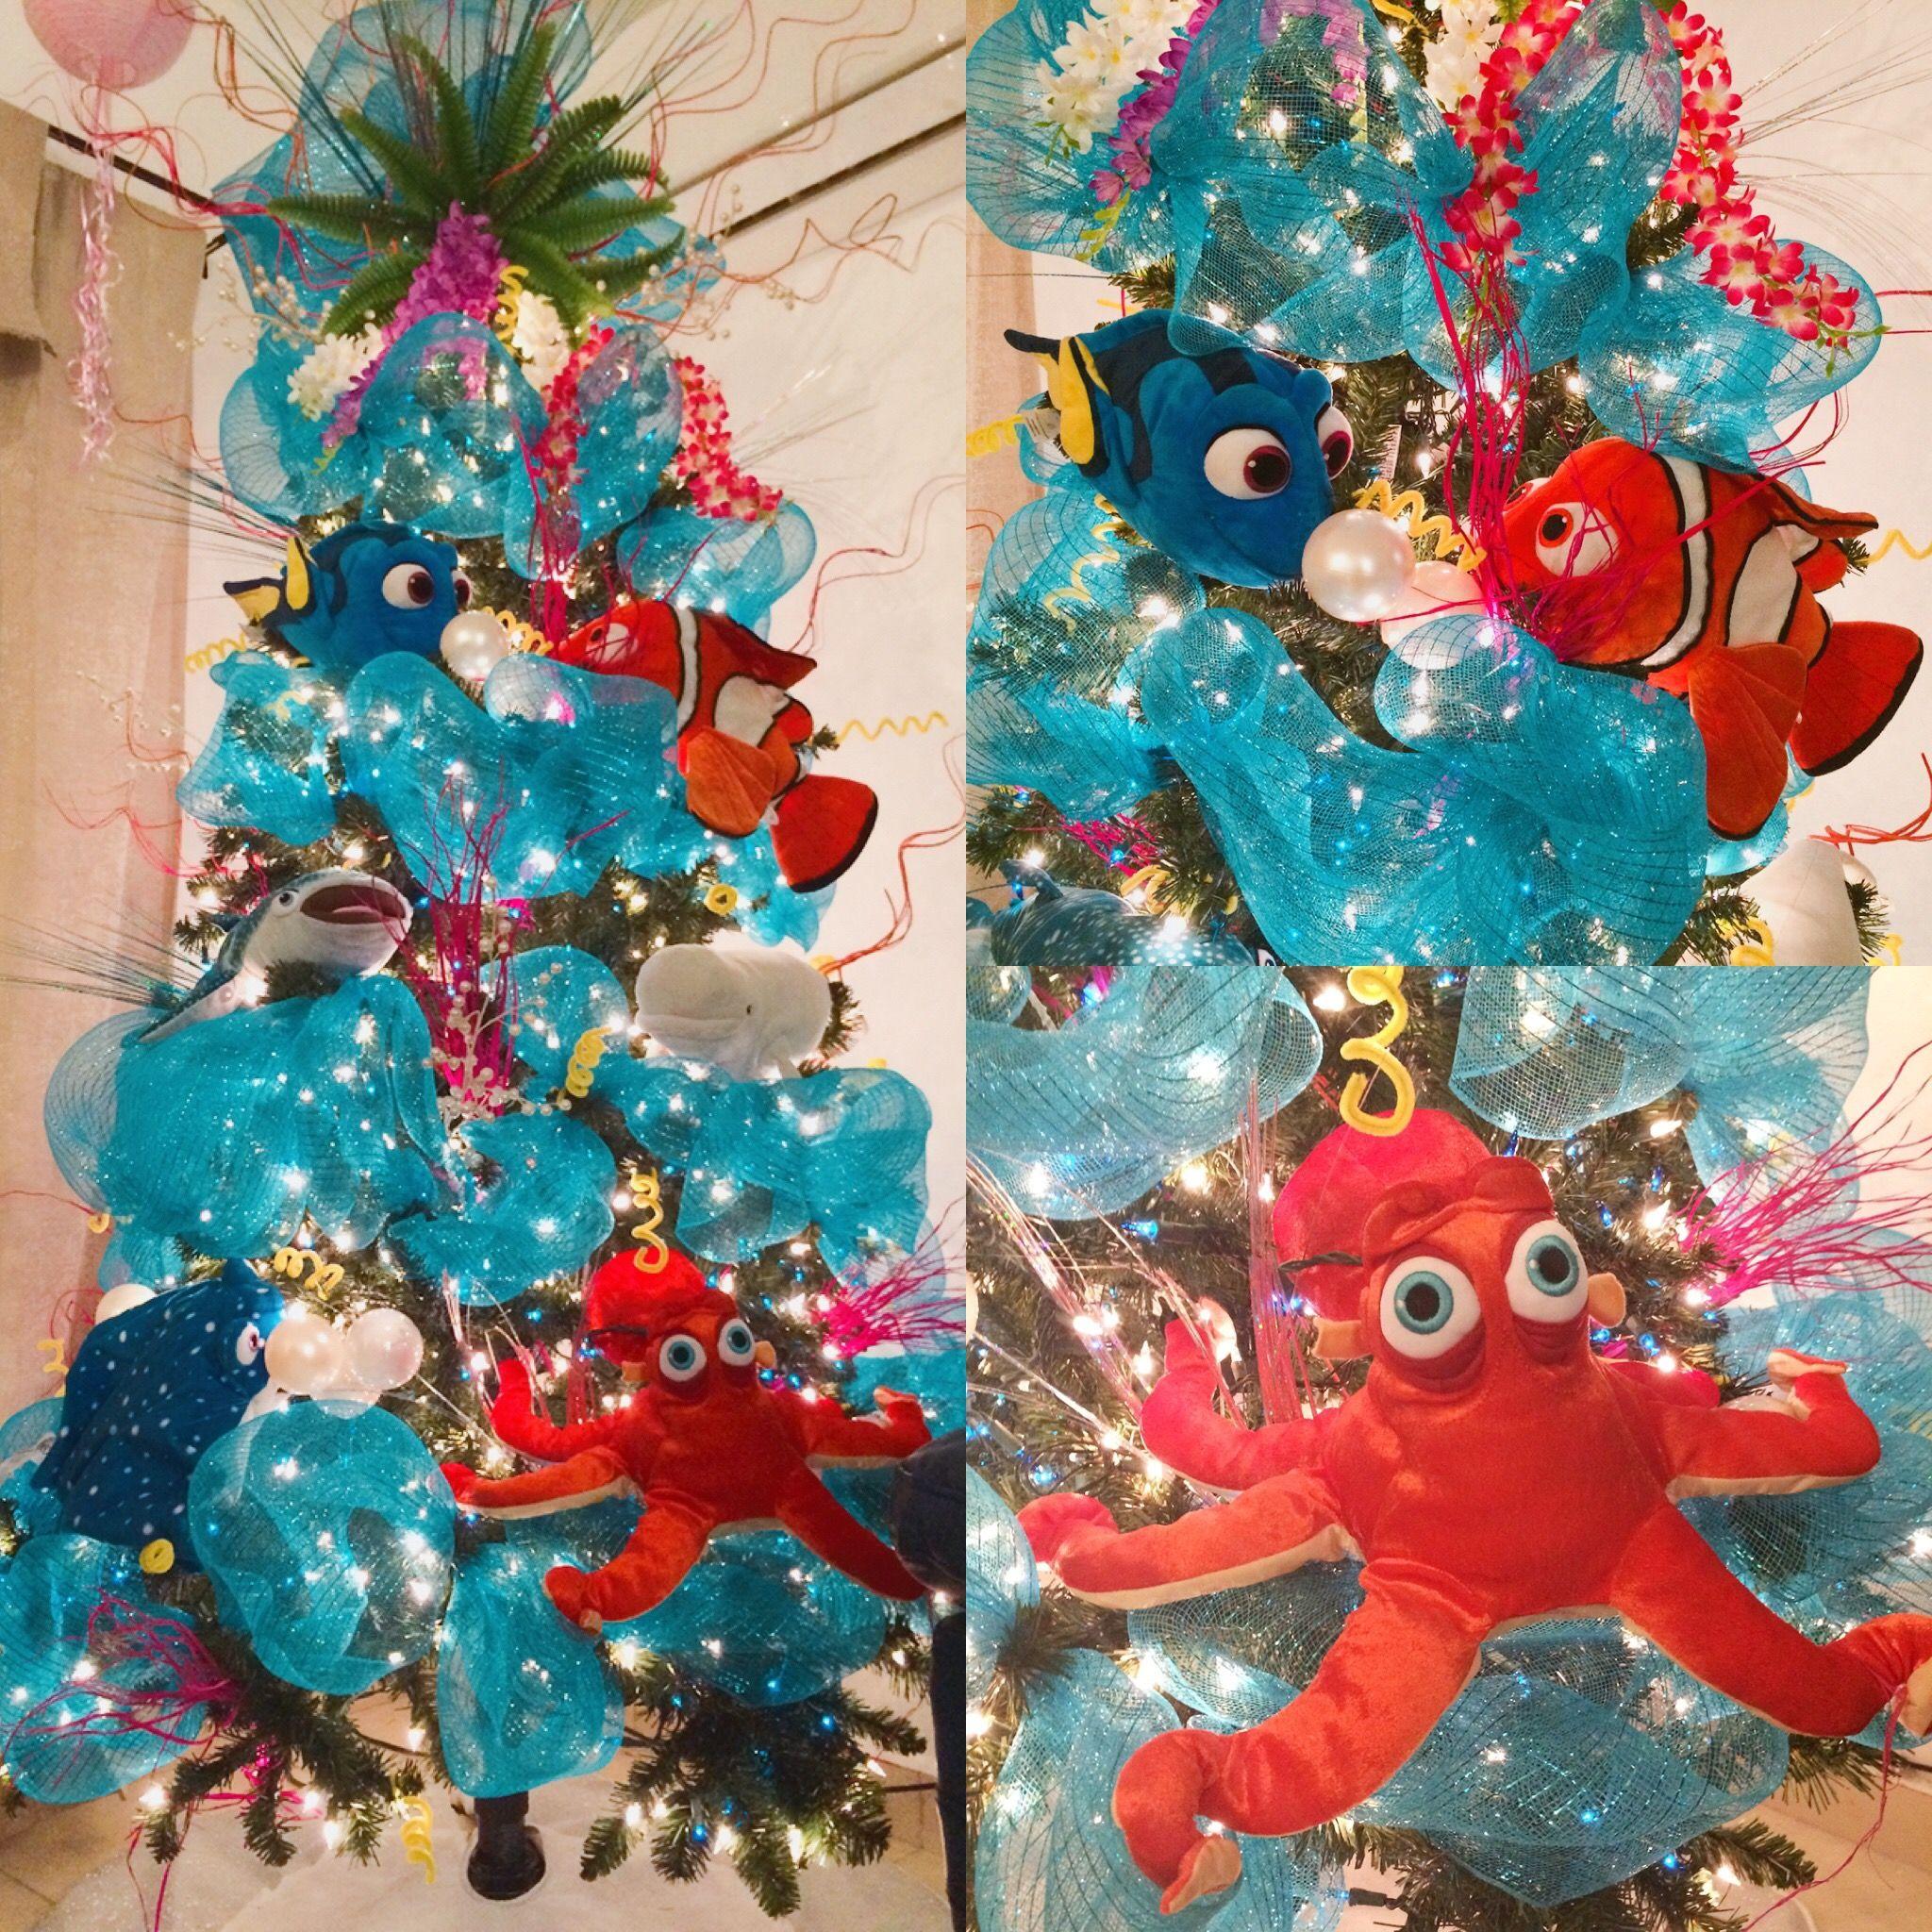 buscando a dorynemo pino de navidad finding dorynemo christmas tree disney christmas - Finding Nemo Christmas Decorations